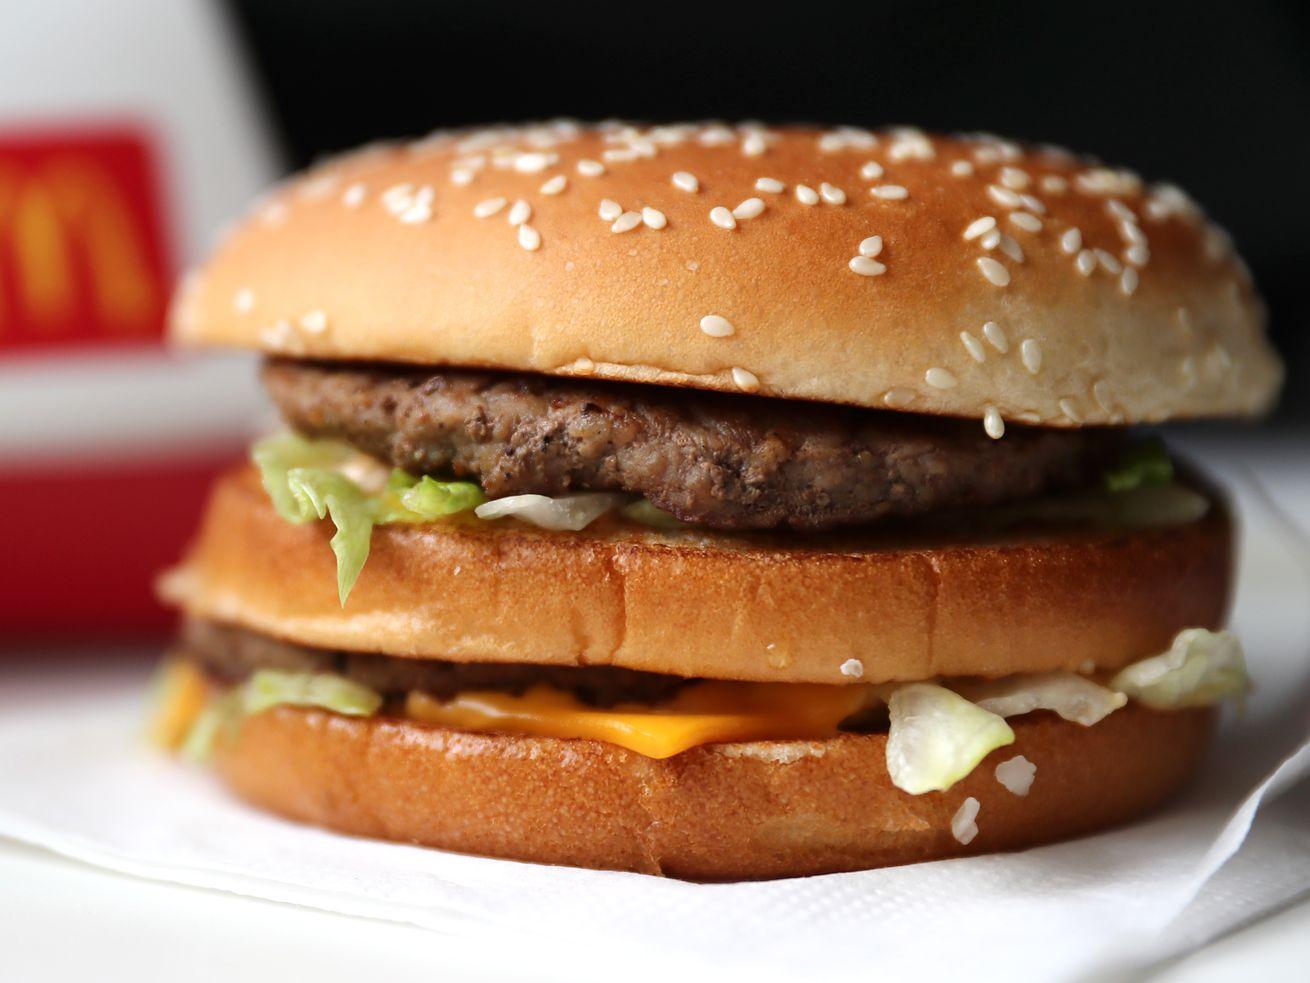 A Meatless McDonald